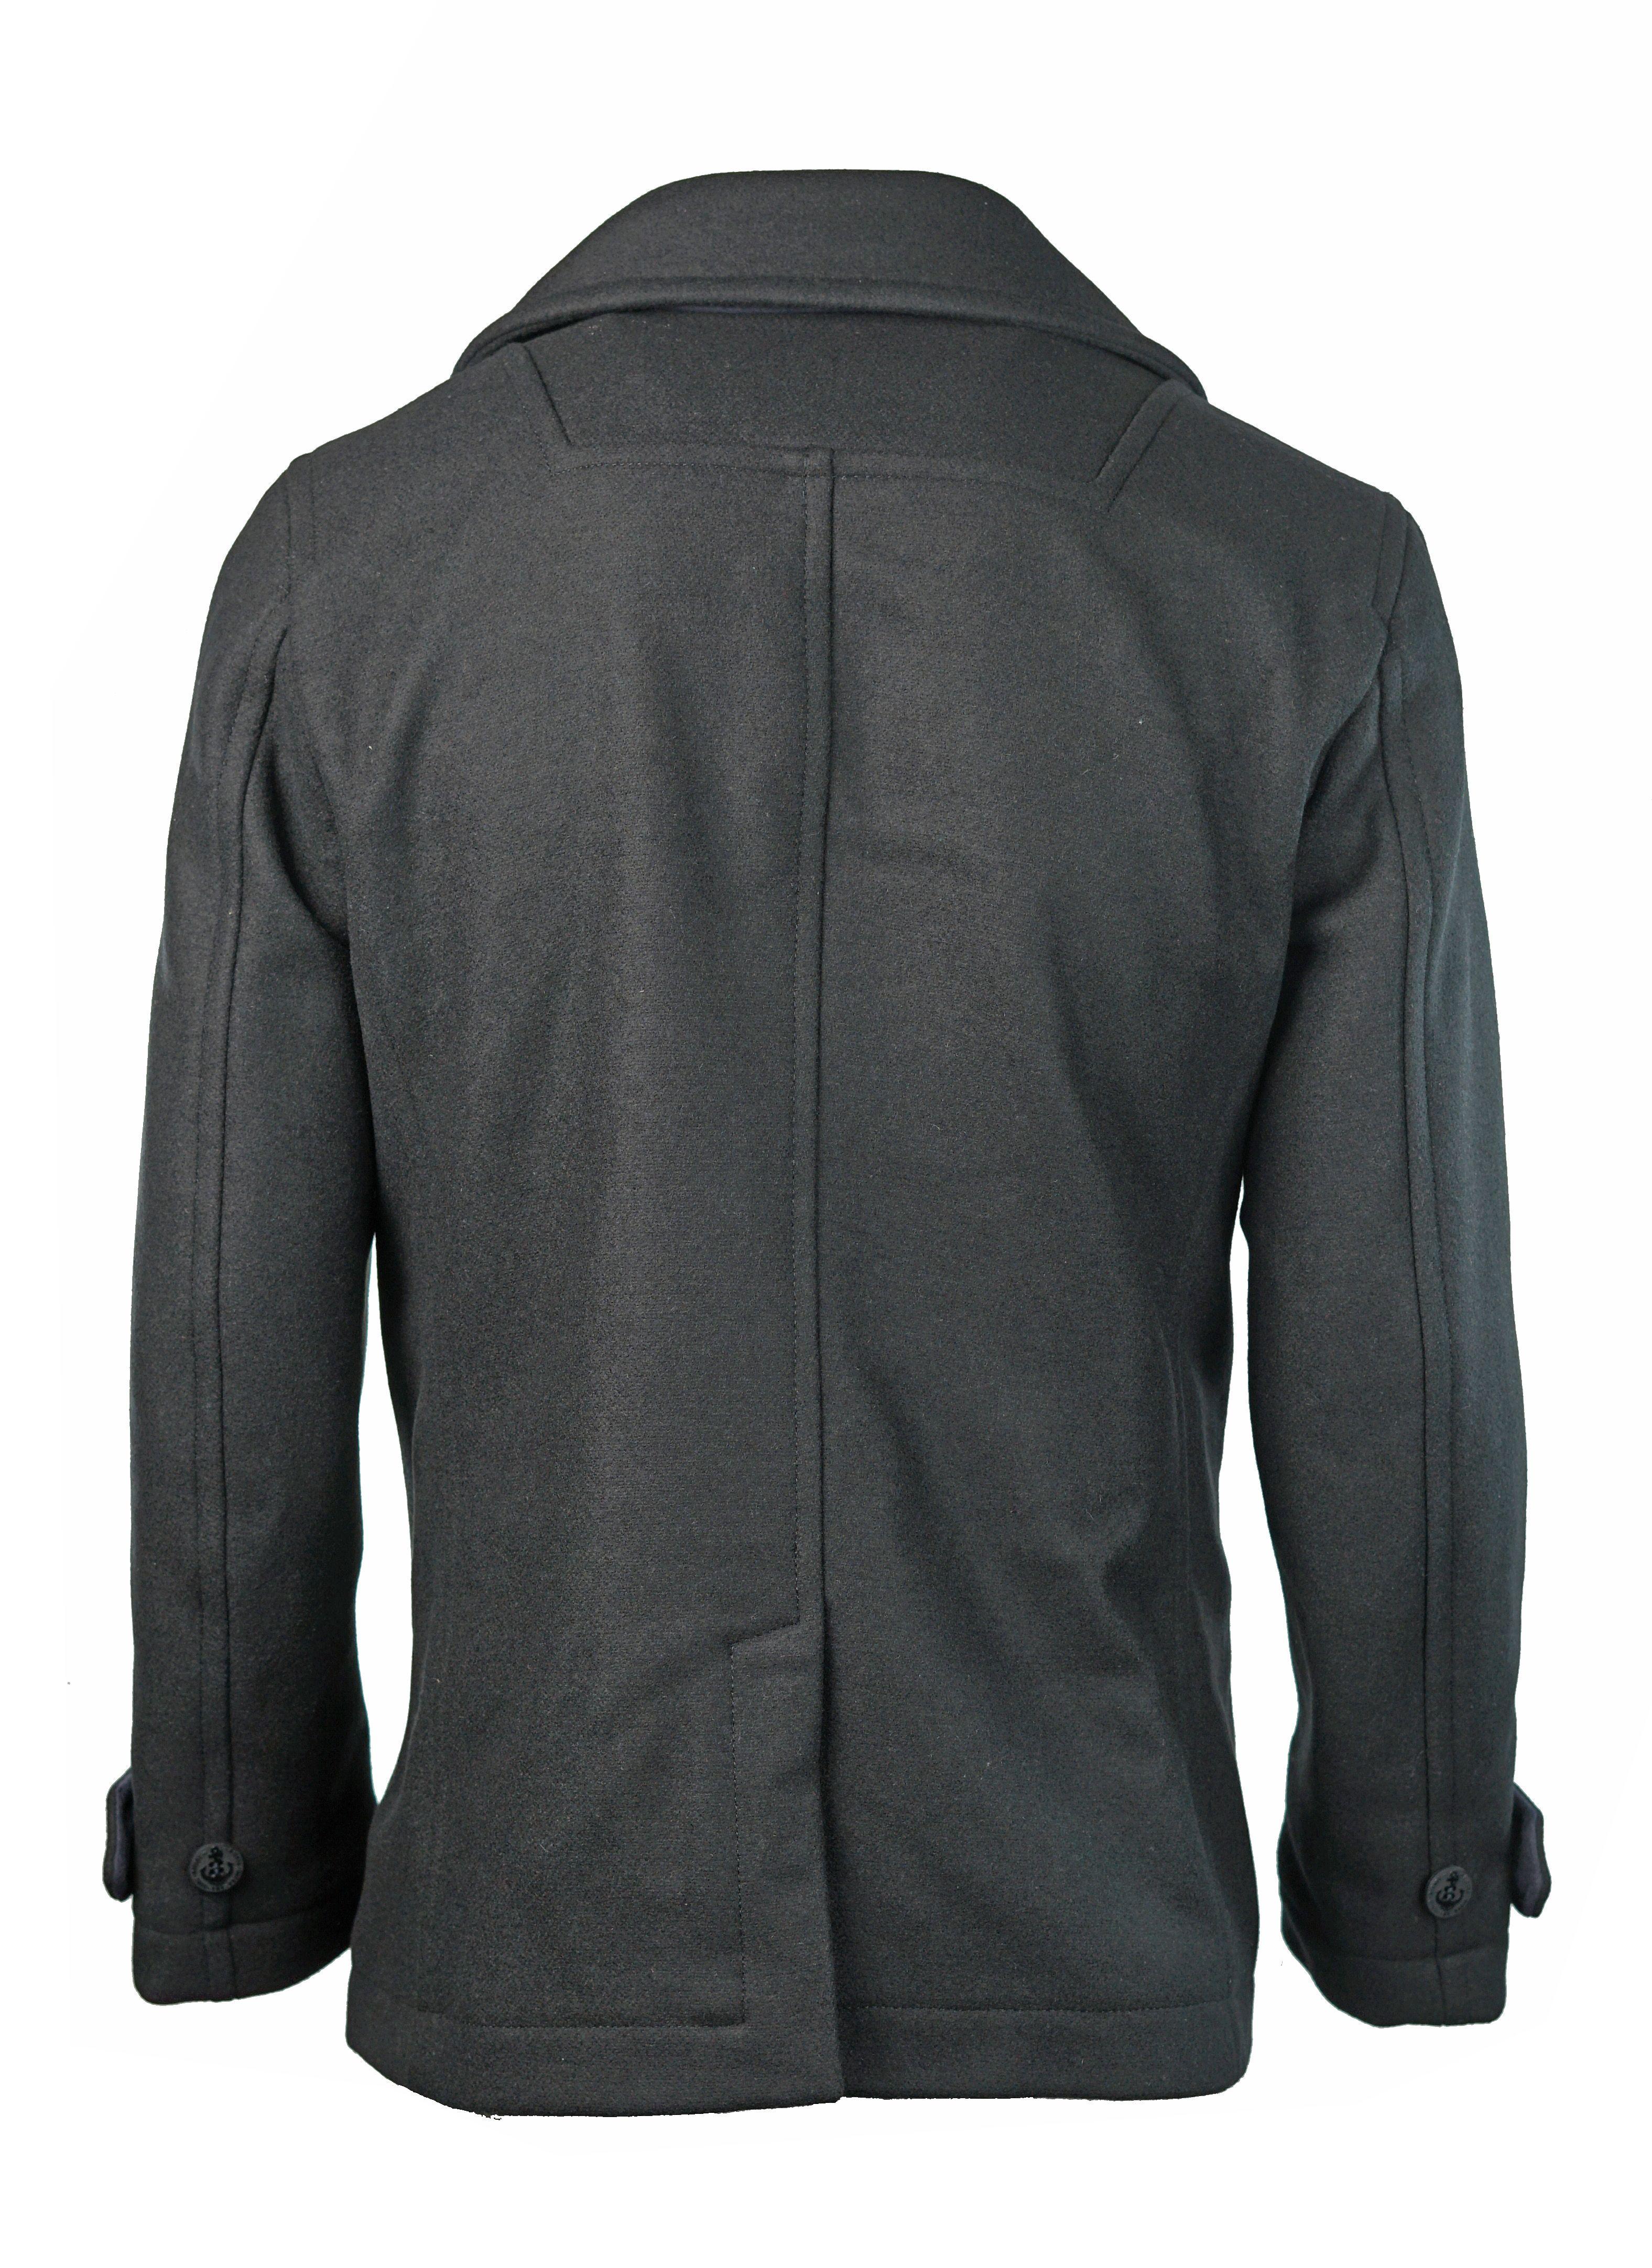 Diesel W-Baniff 900 Jacket